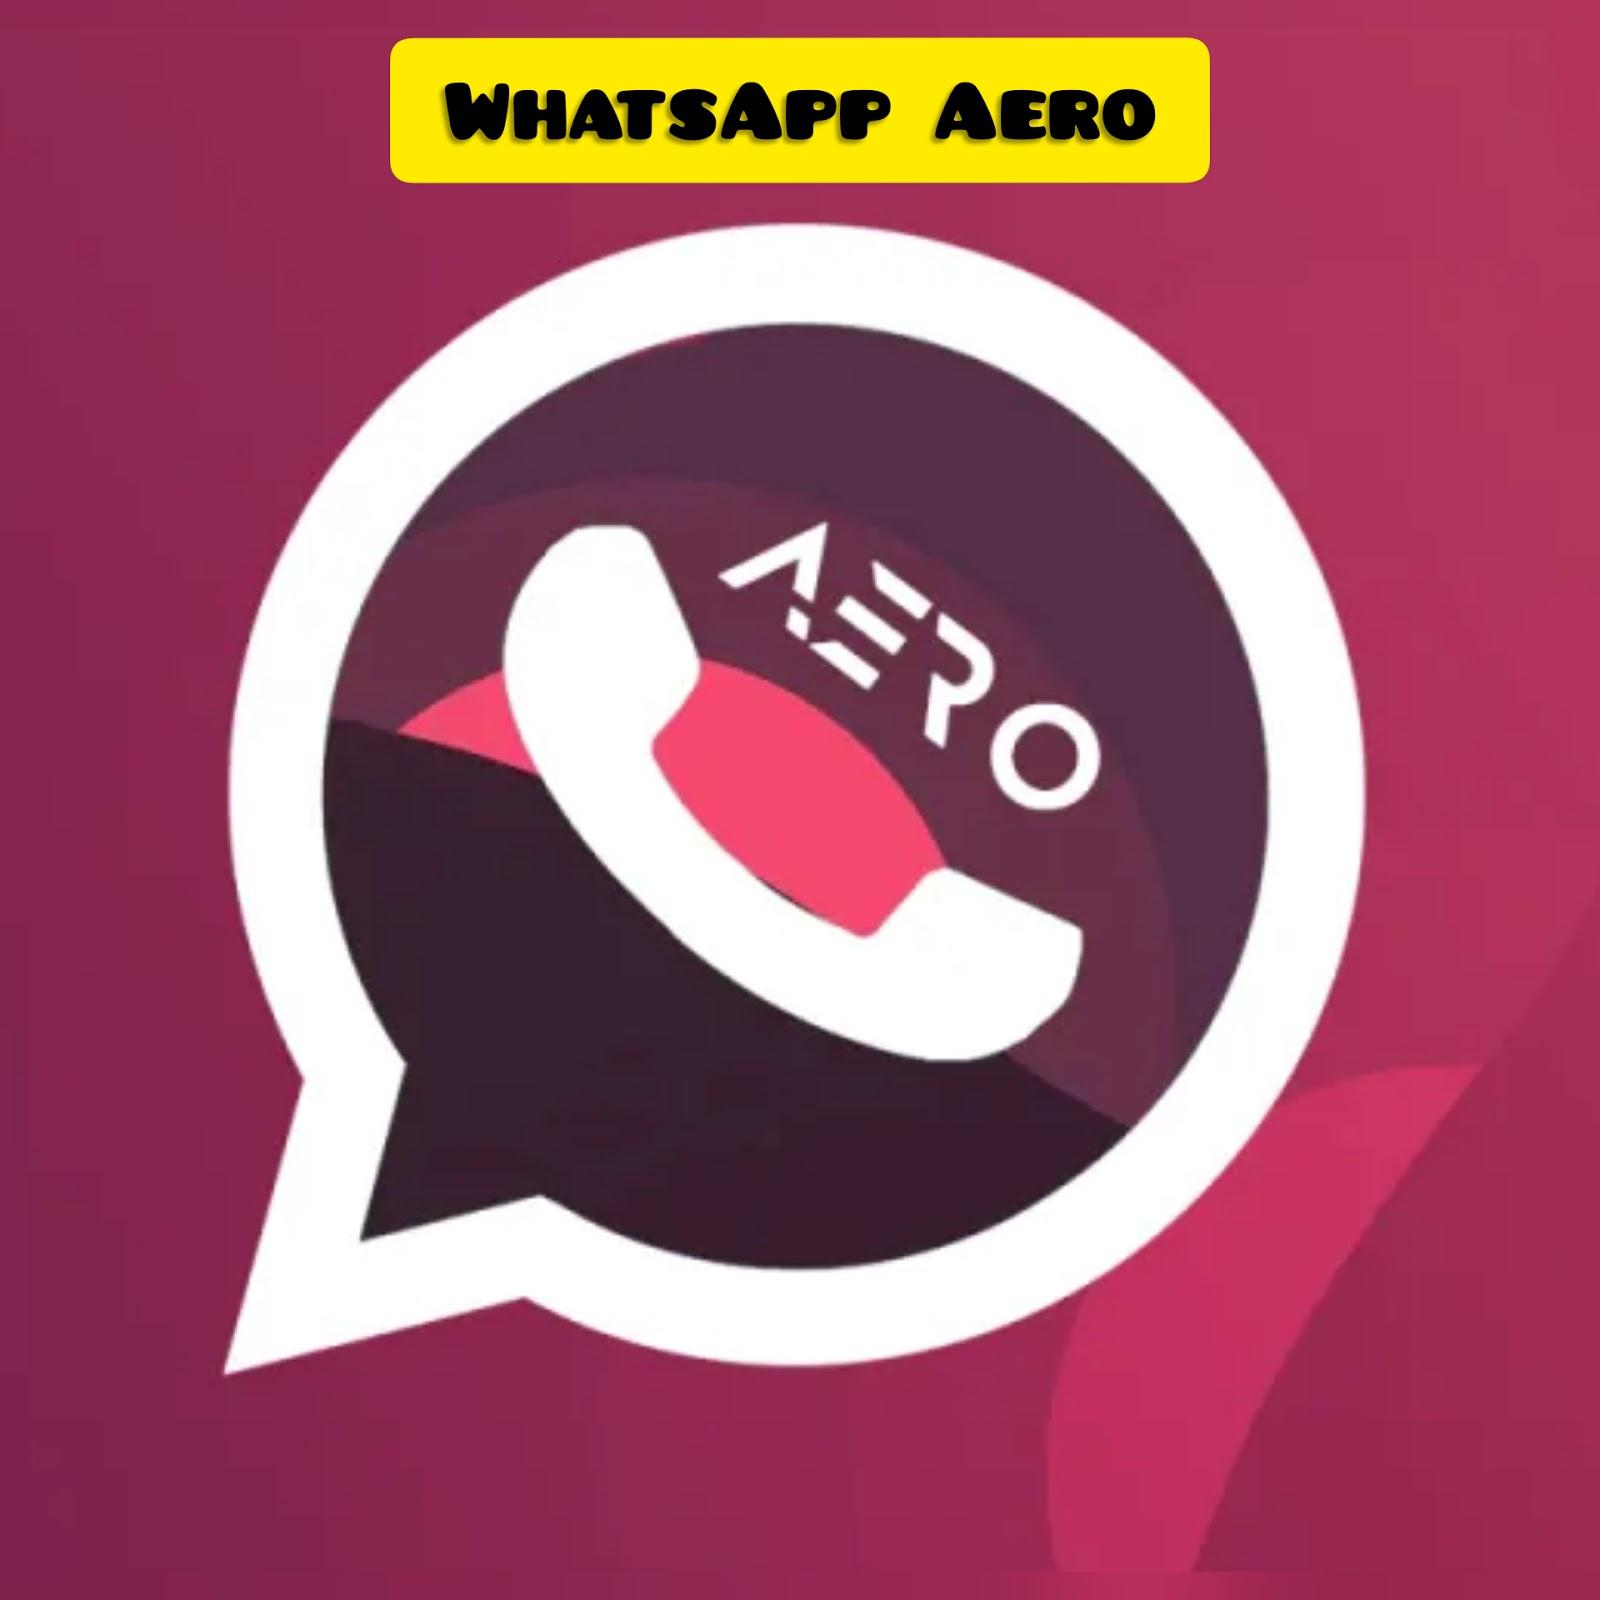 Aero WhatsApp APK 8.0 Download Latest Version In {2019}